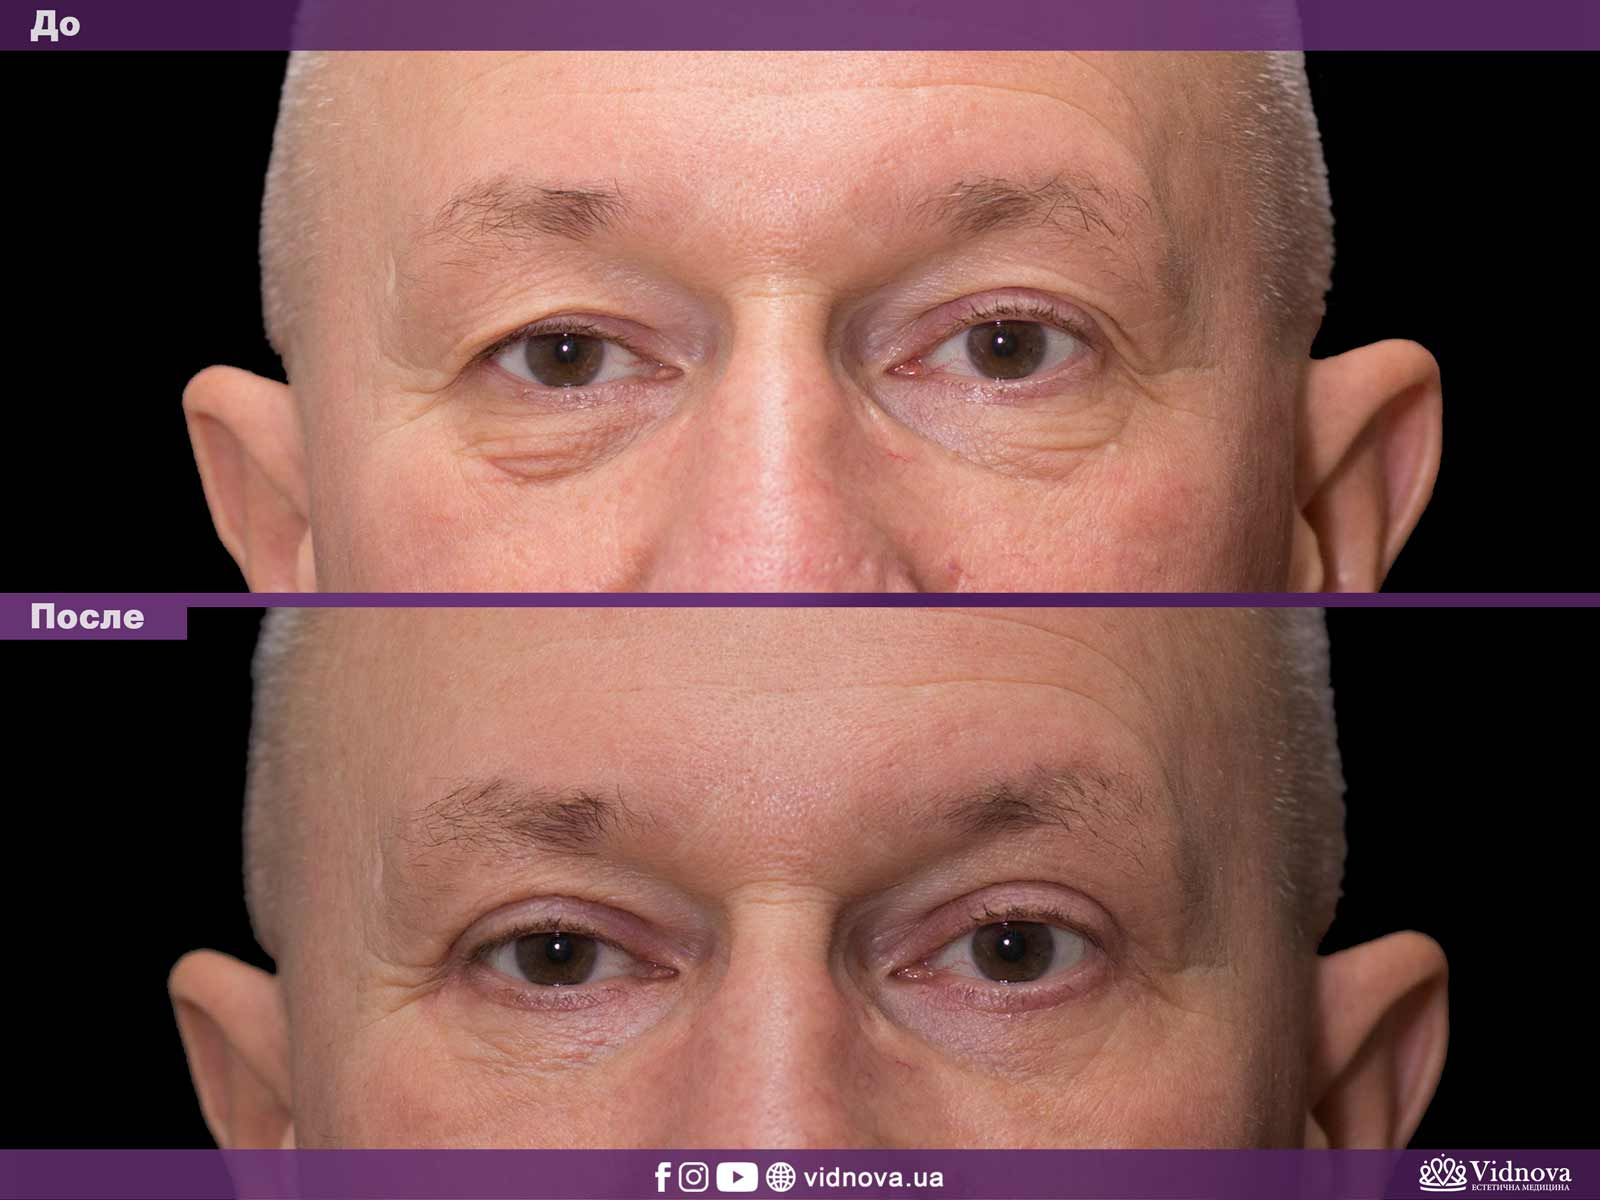 Блефаропластика: Фото До и После - Пример №35-1 - Клиника Vidnova